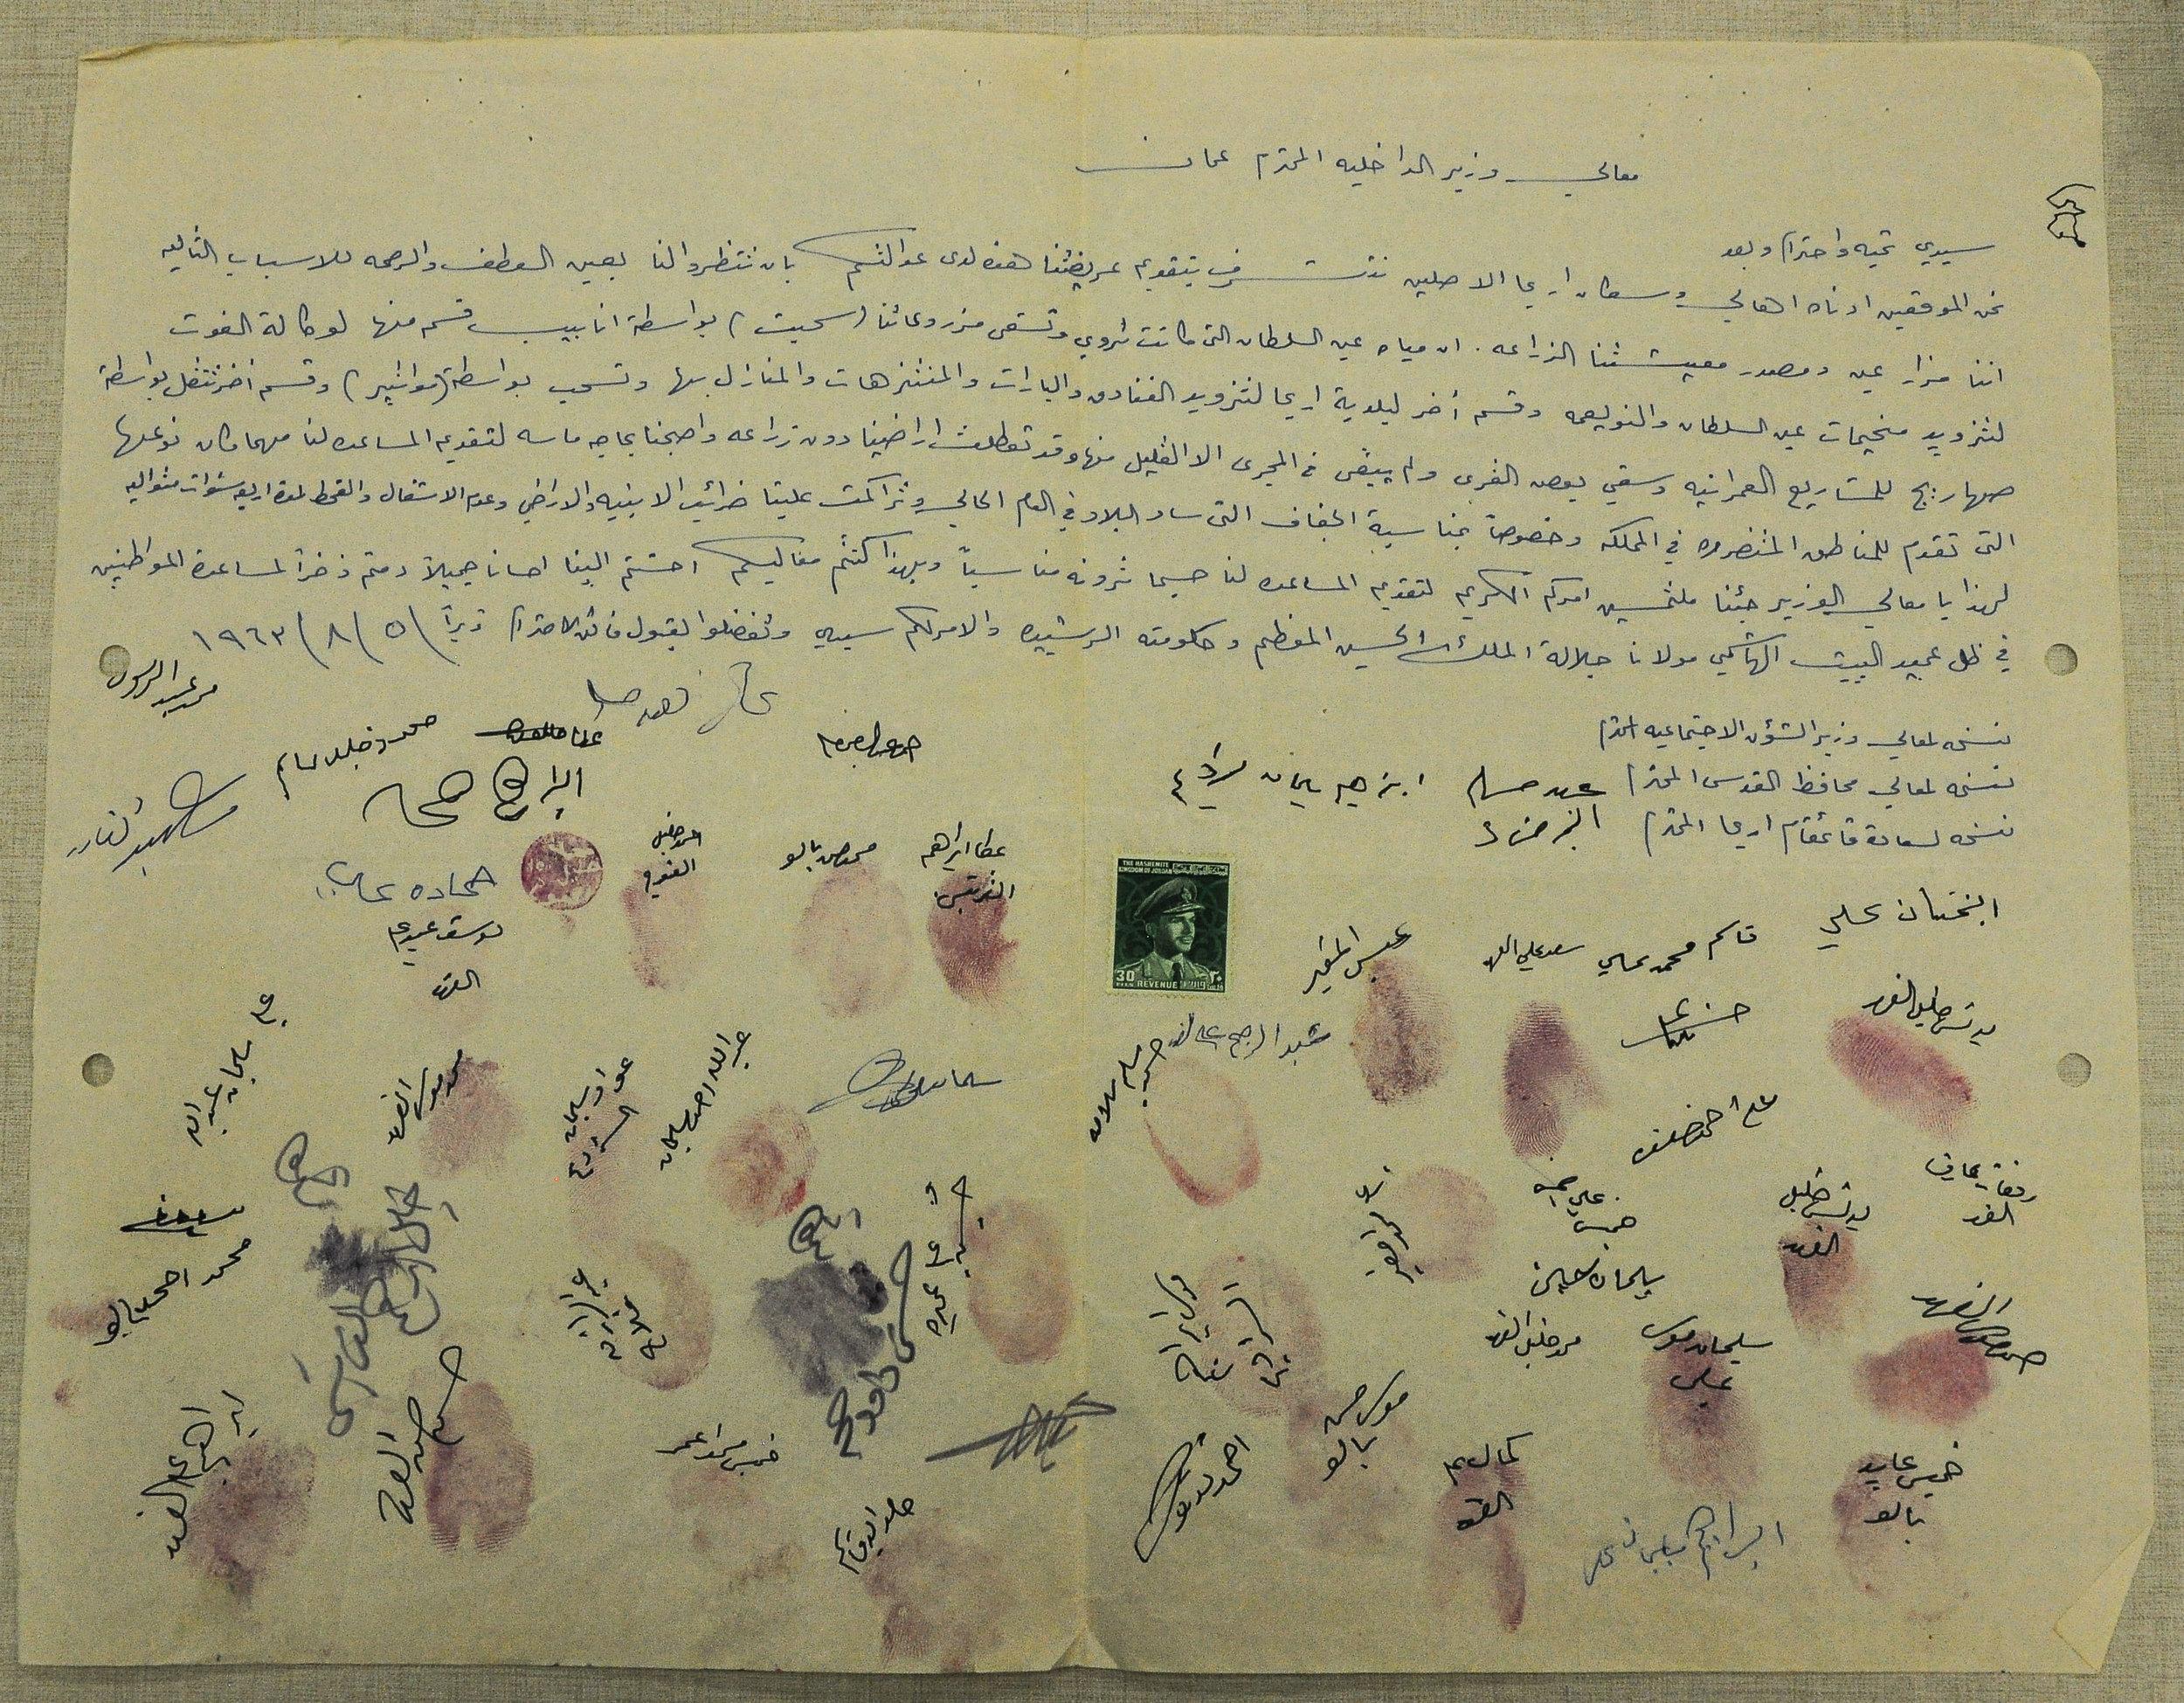 Israel State Archives, MGA 39/11.